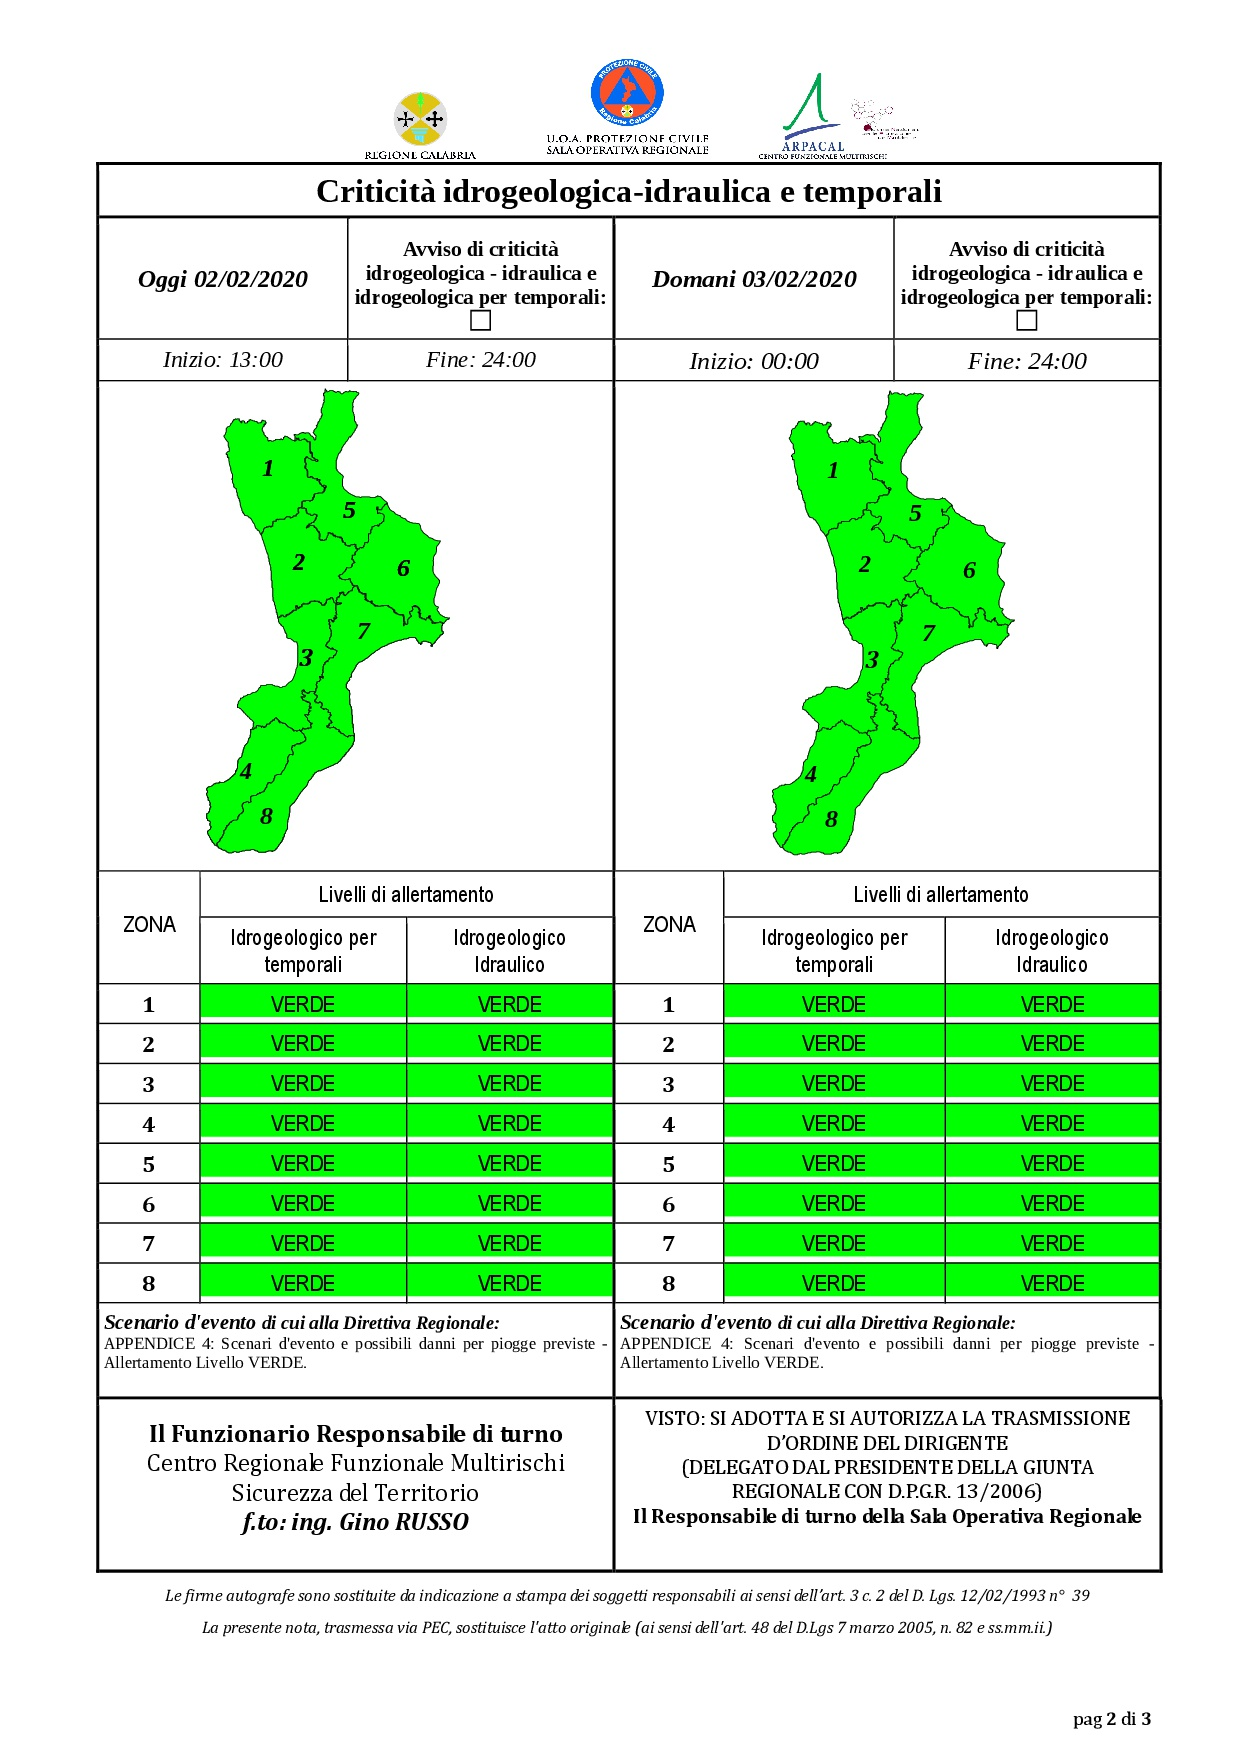 Criticità idrogeologica-idraulica e temporali in Calabria 02-02-2020